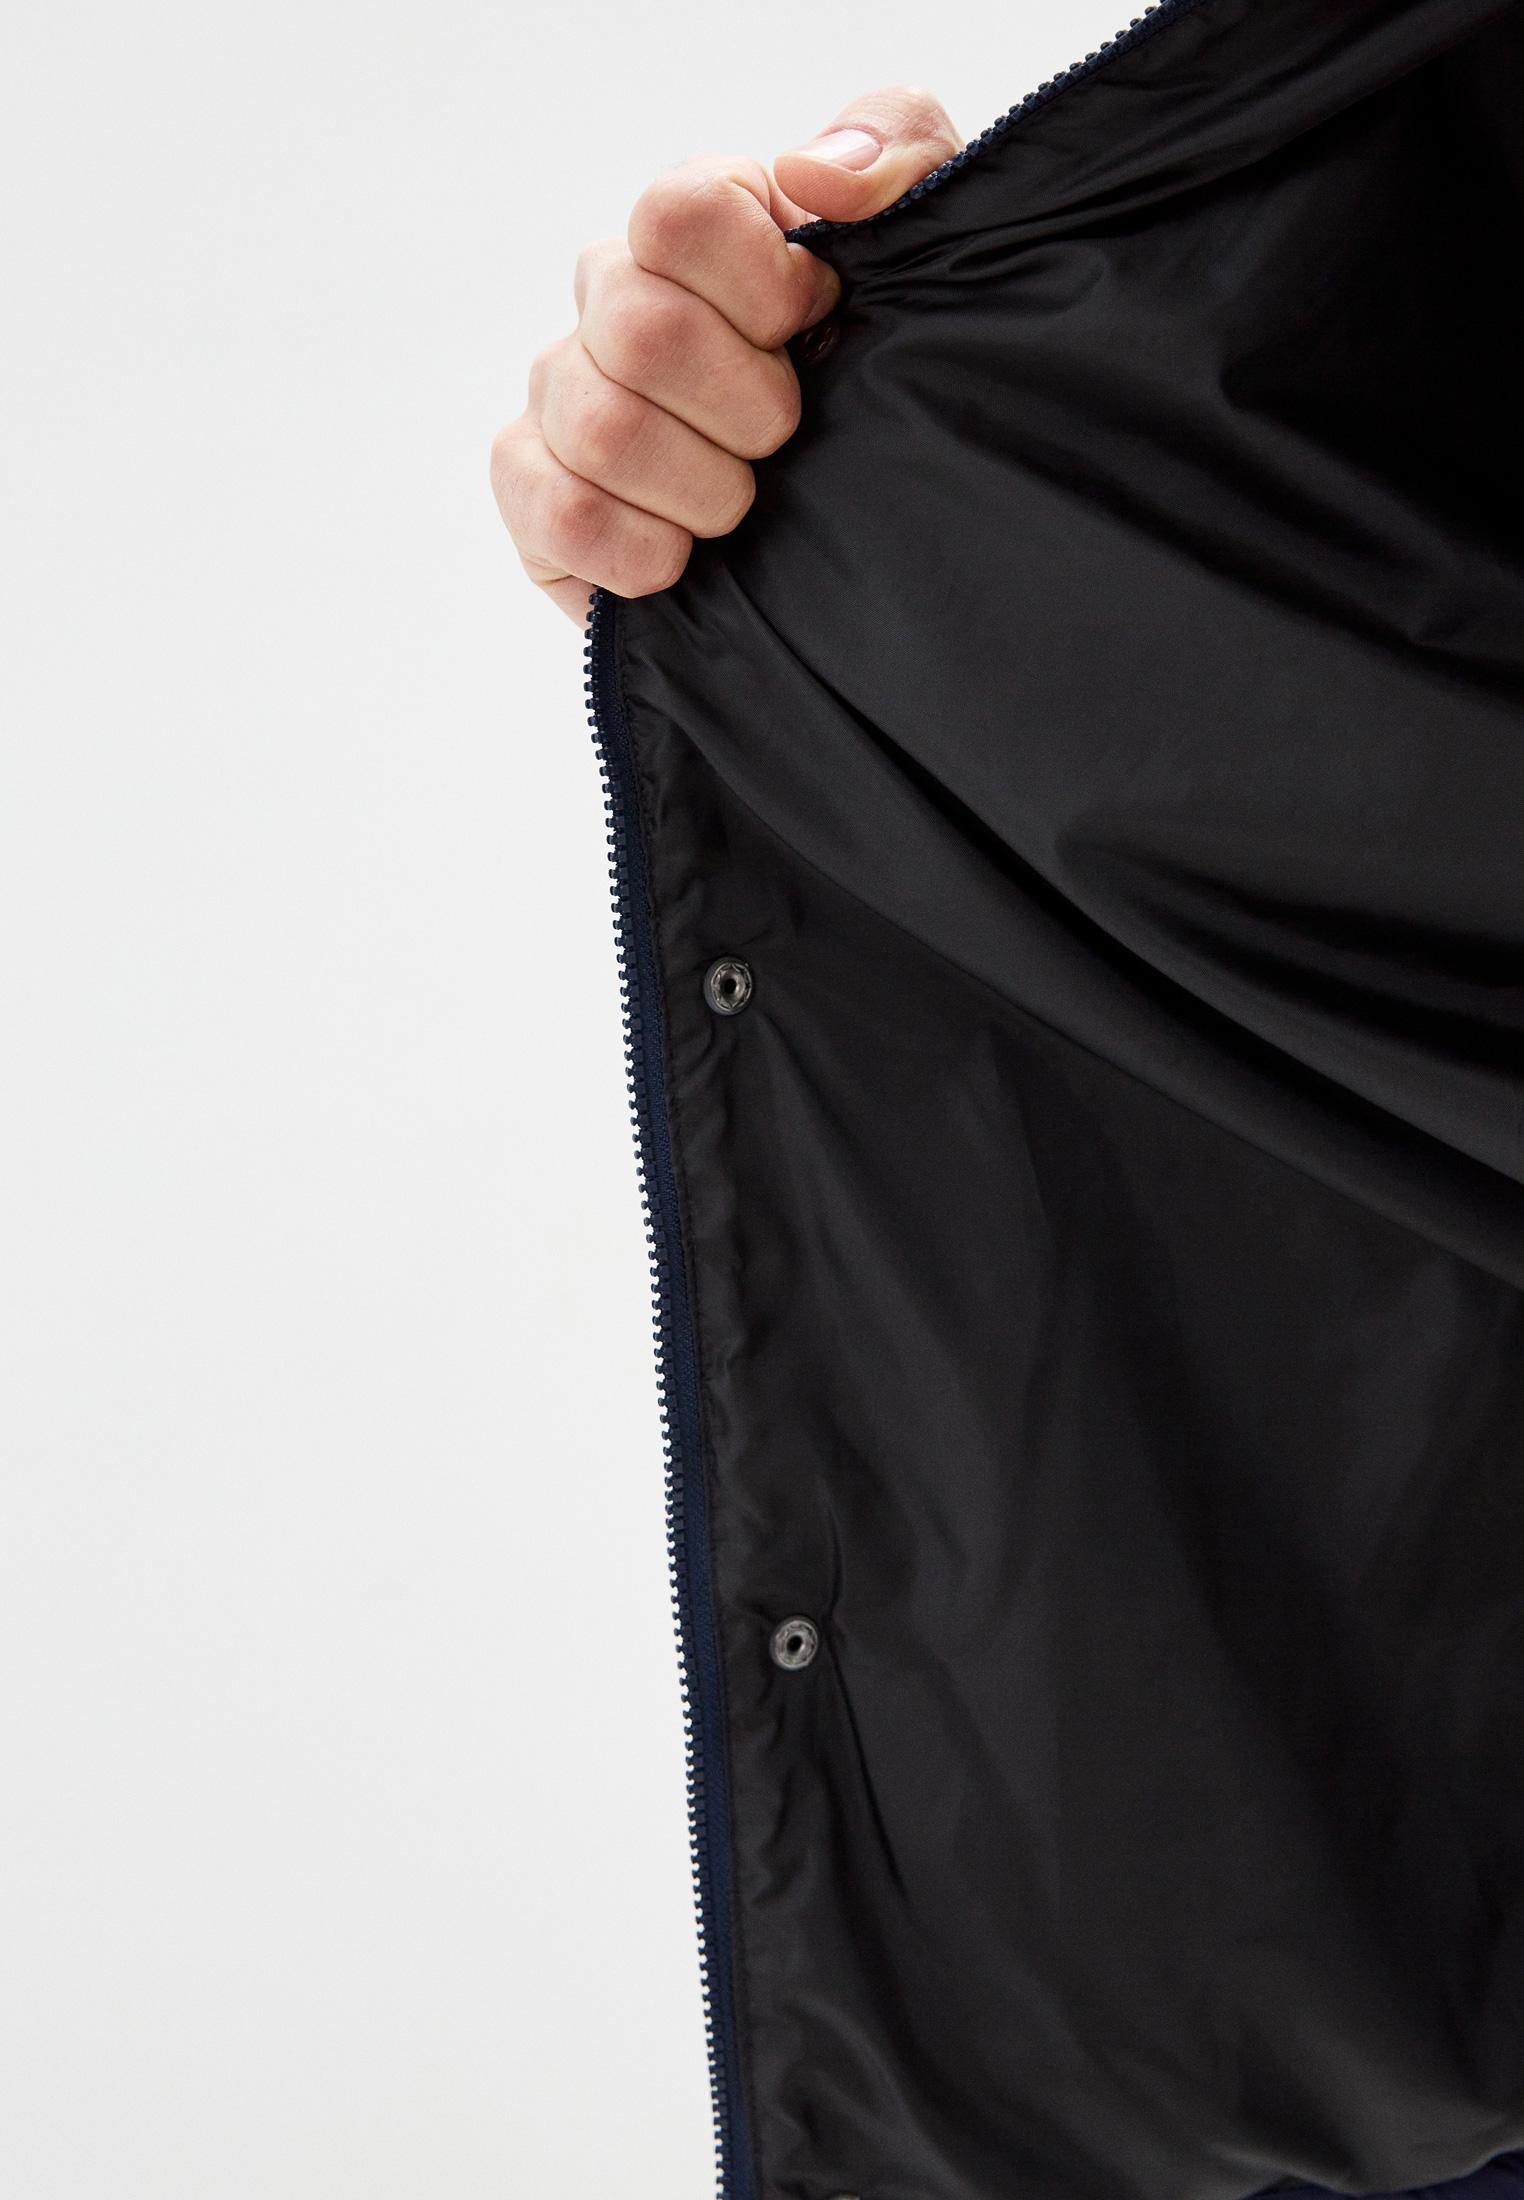 Куртка VANS VA457OLKZ: изображение 4